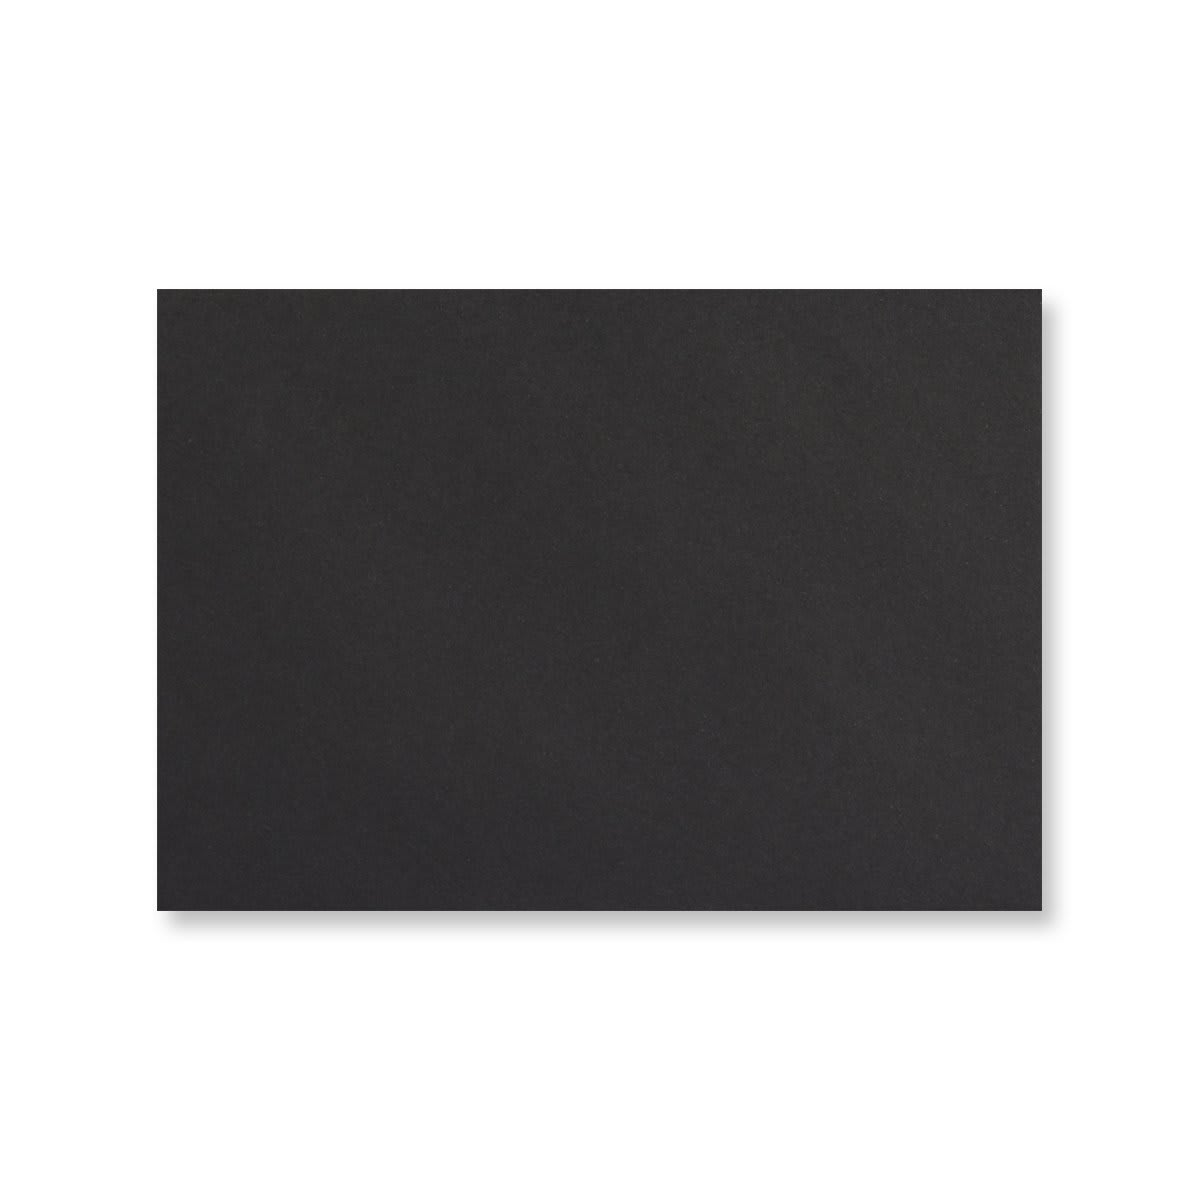 C6 BLACK ENVELOPES 120GSM